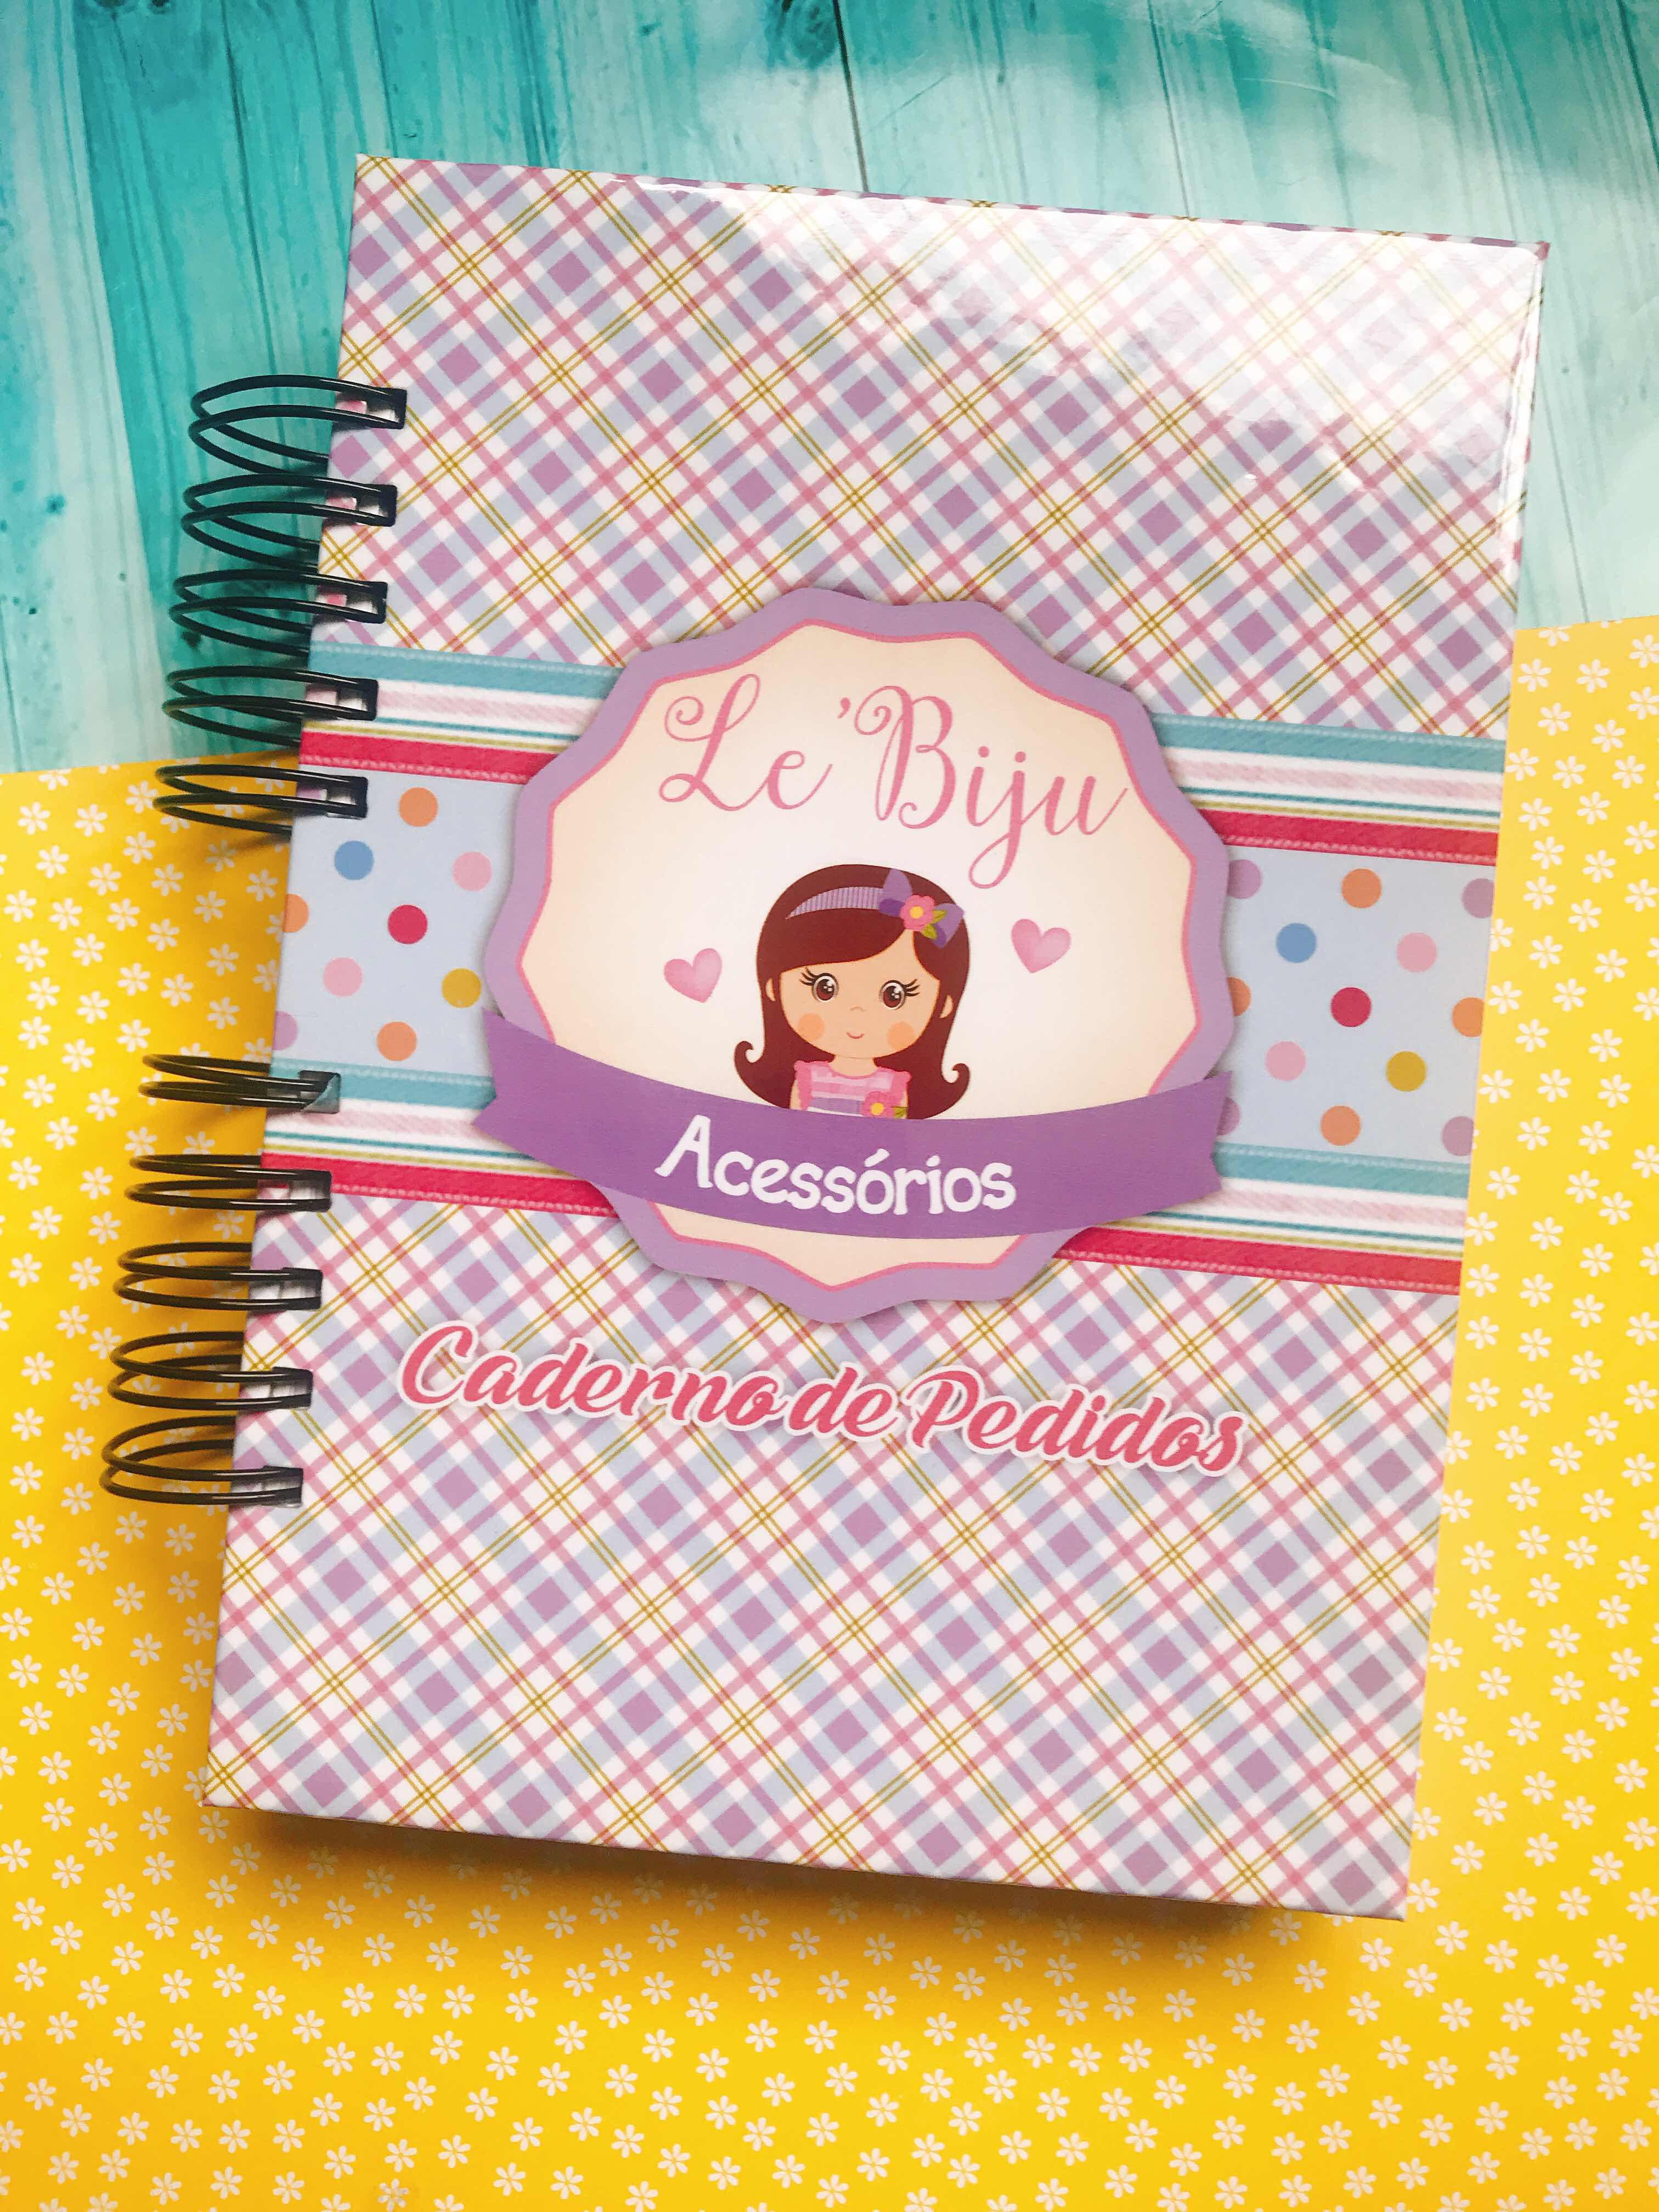 Caderno de pedidos Lê Biju